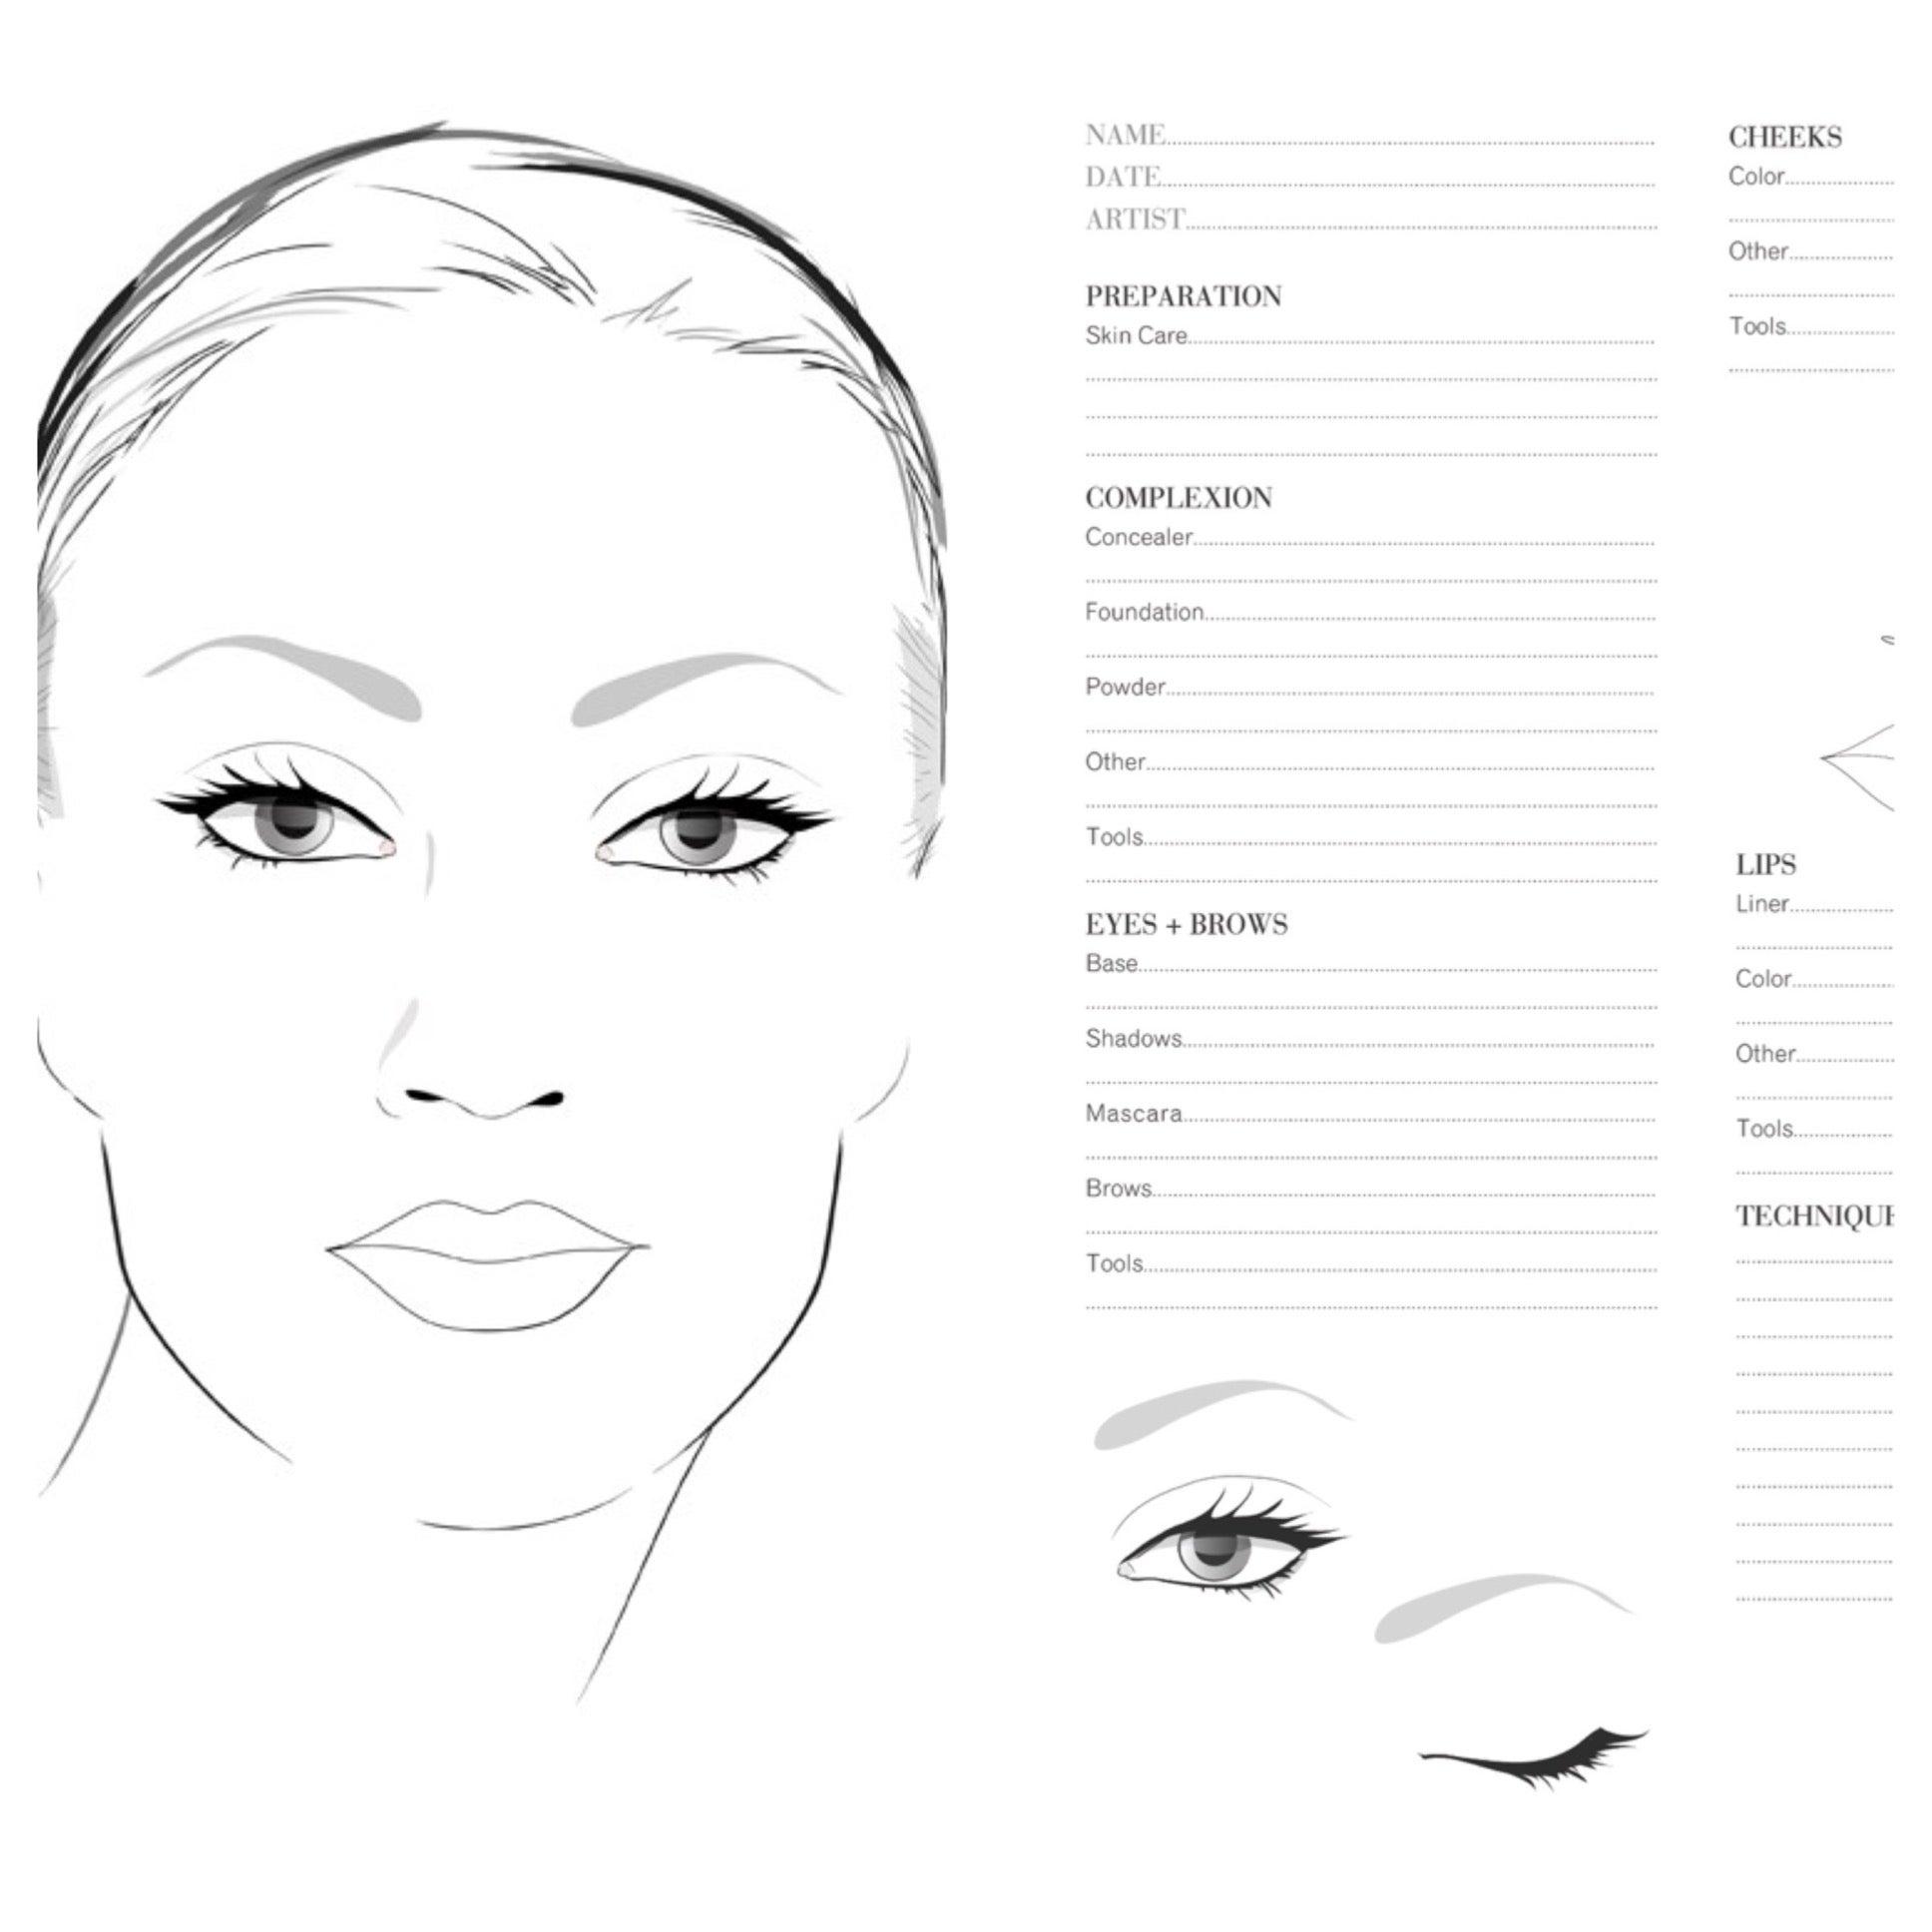 Makeup Charts 5 000 Makeup Looks Ideas Amp Trends